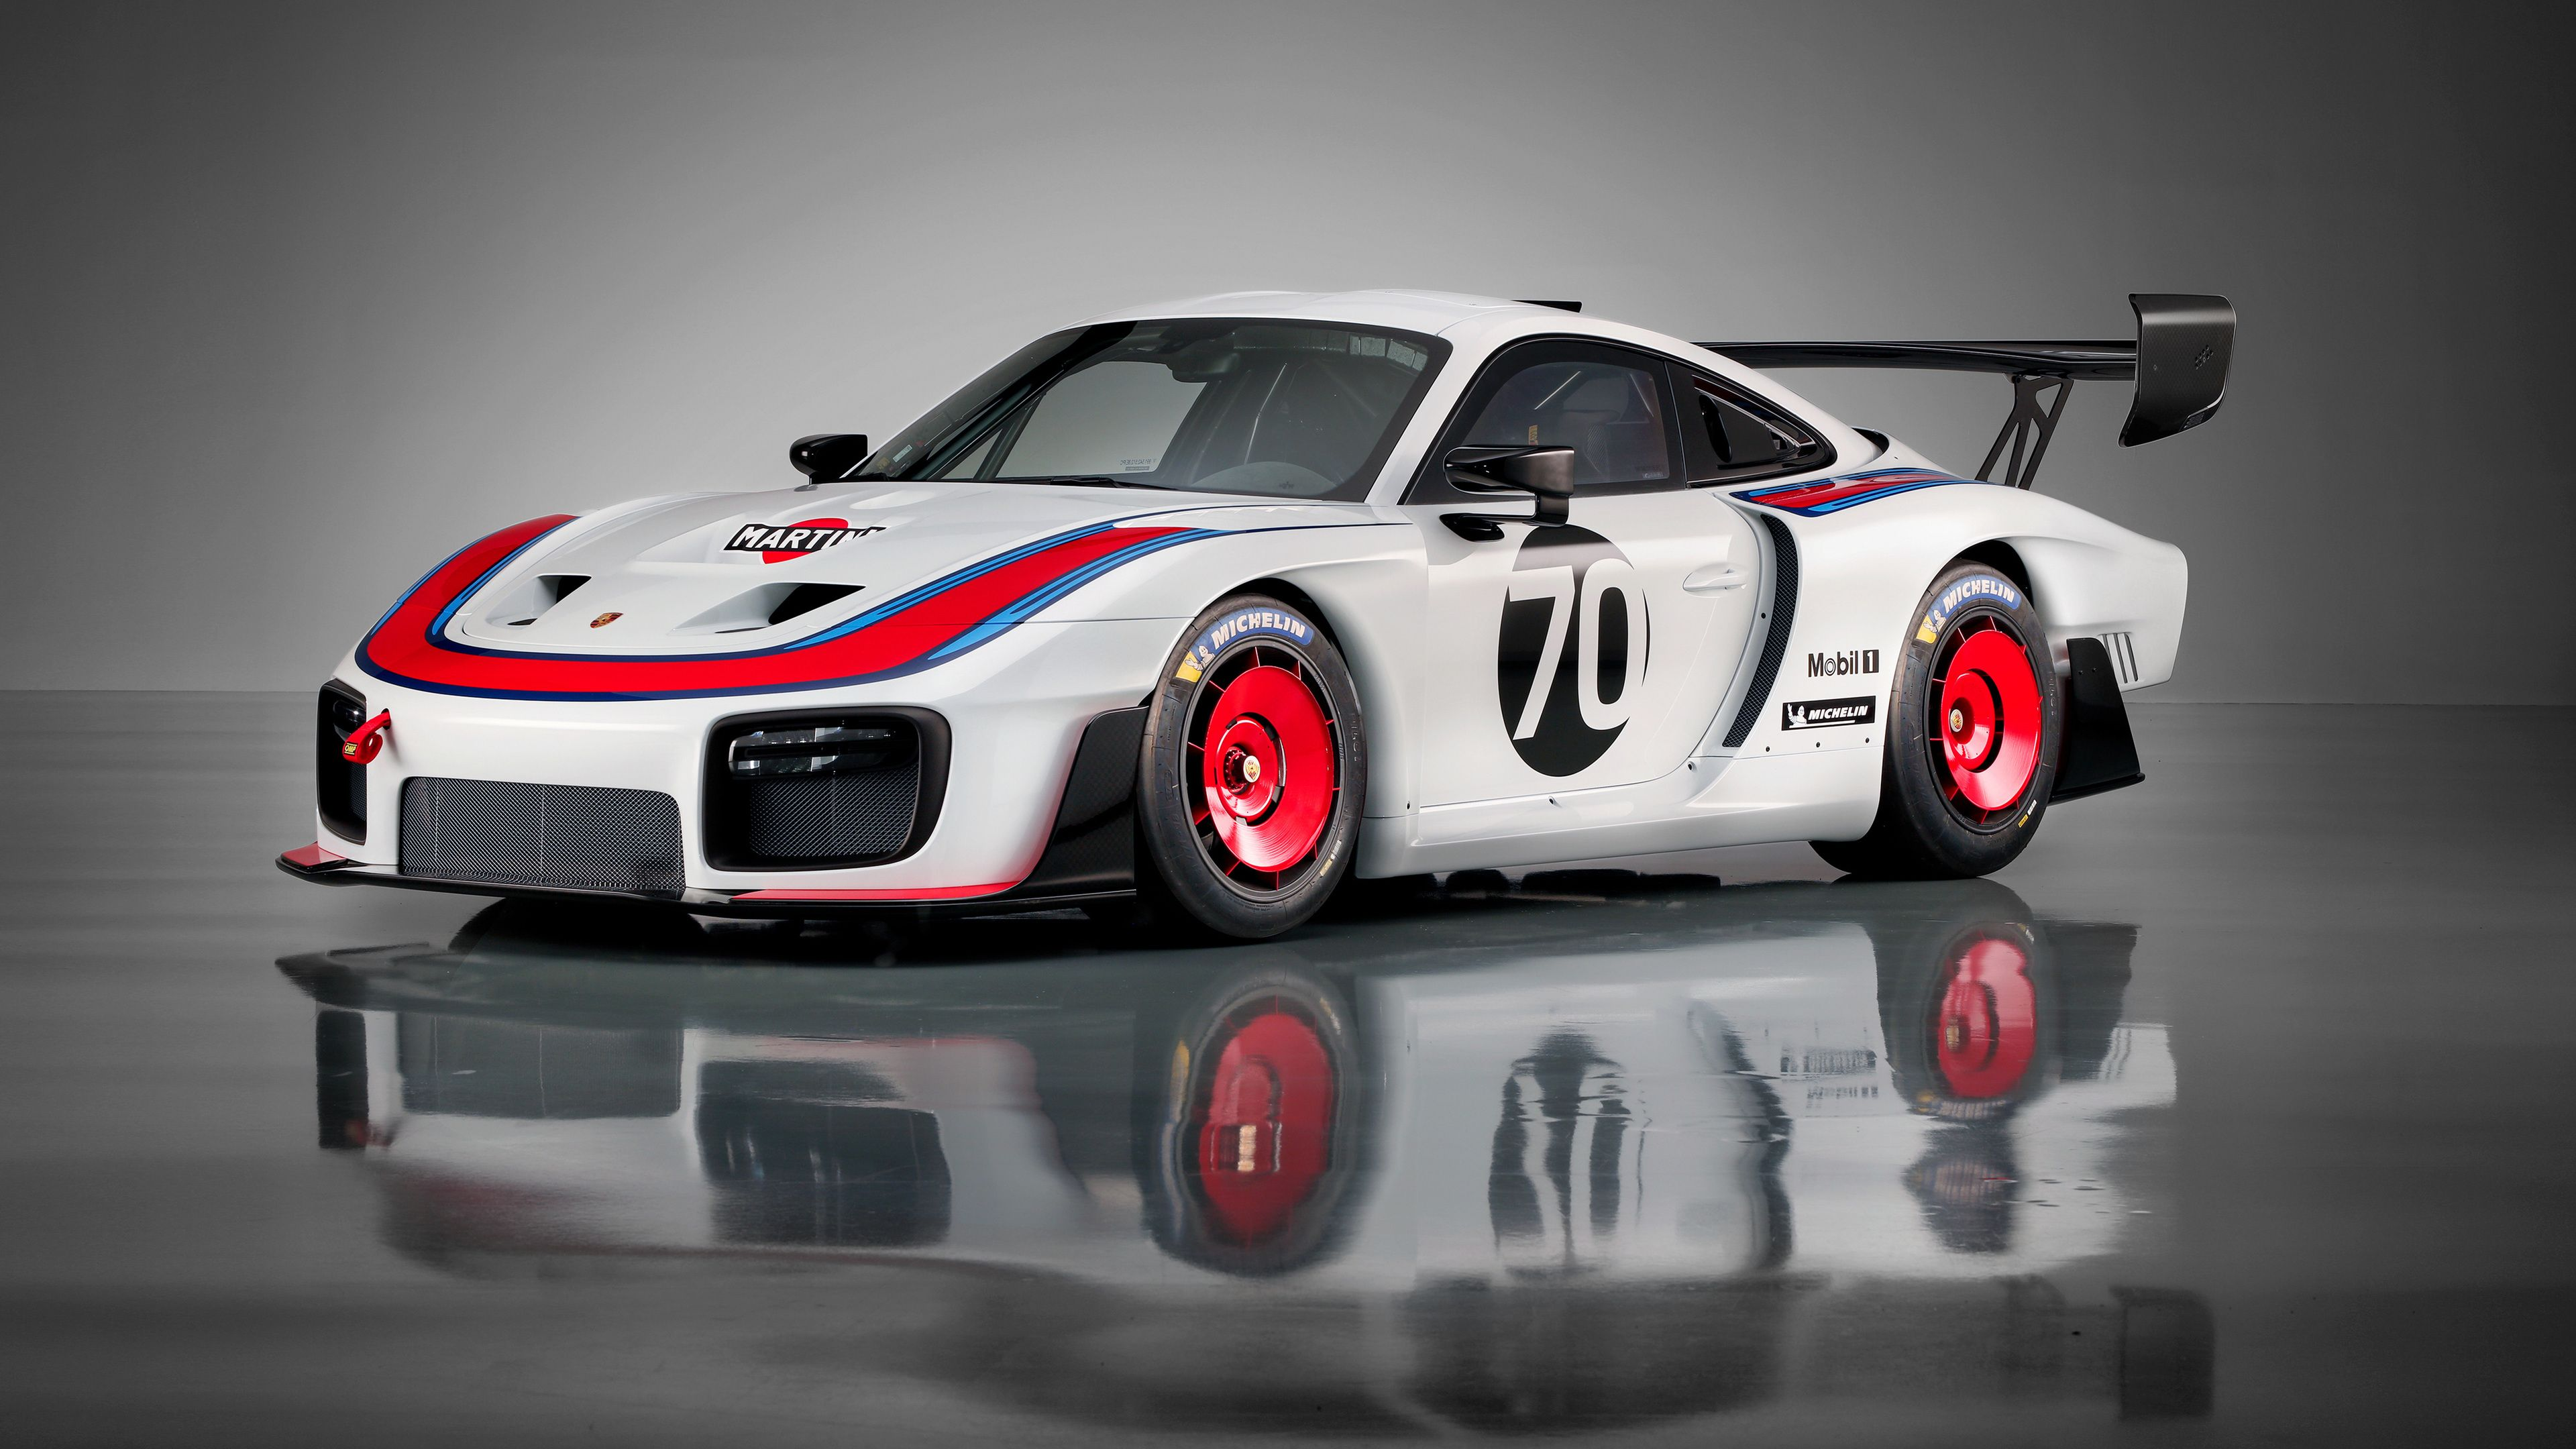 Porsche 935 2019 Porsche 4k Wallpapers Porsche 935 Wallpapers Hd